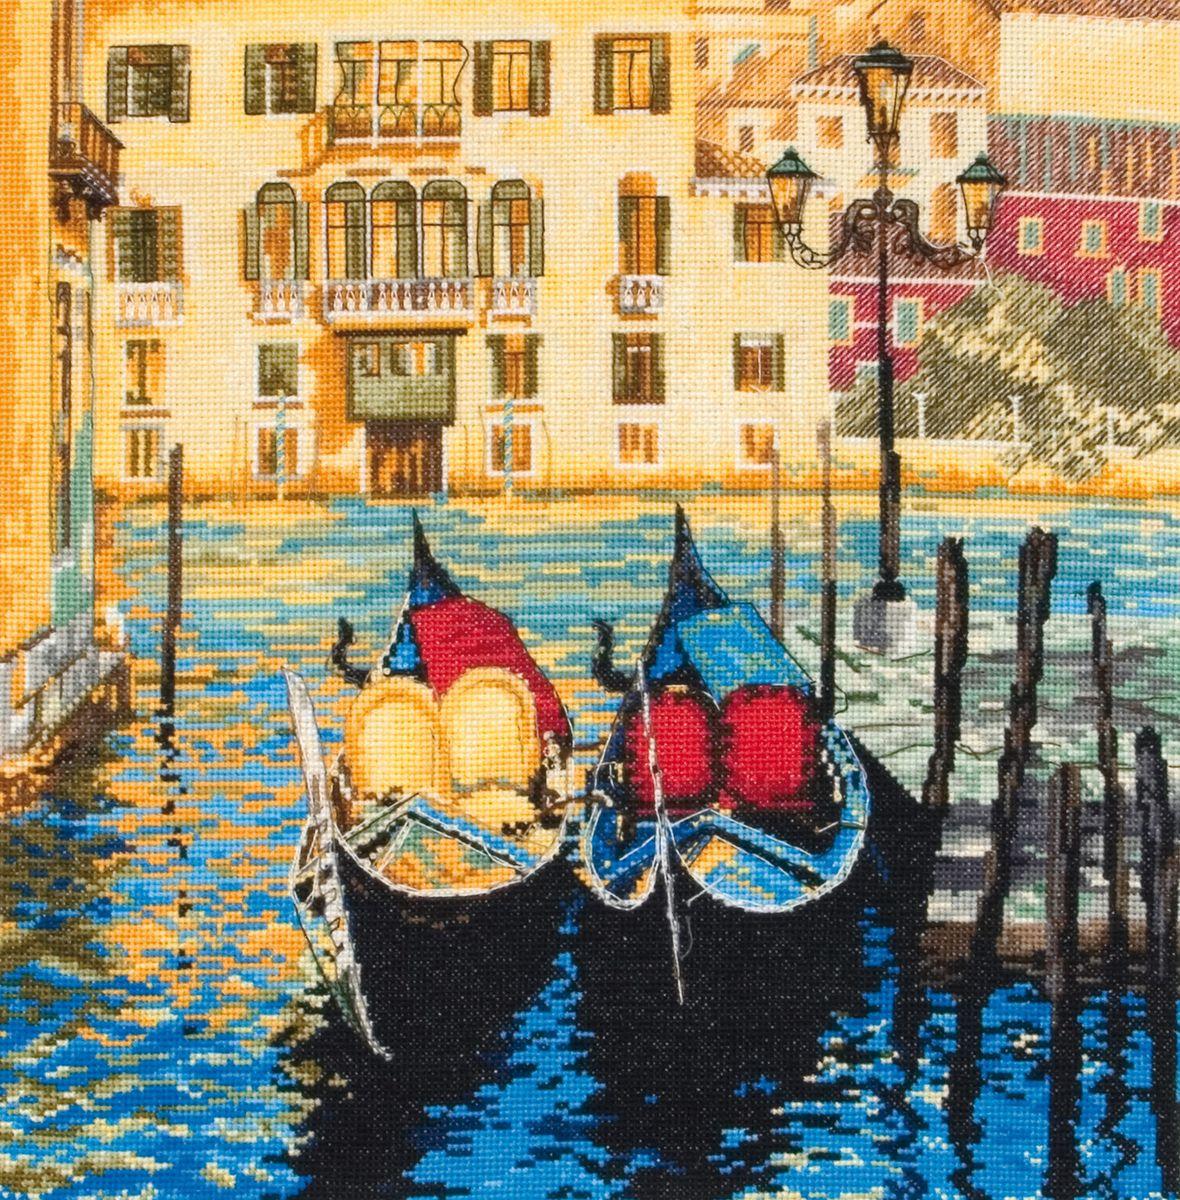 ����� ��� ��������� Maia Venice /�������/ 30*30�� (������: ����� Aida 16, ������� �����, ����� Anchor, ����, ����������), ������� ����� - Coats5678000-01098����� ��� ��������� Maia Venice /�������/ 30*30�� (������: ����� Aida 16, ������� �����, ����� Anchor, ����, ����������), ������� �����